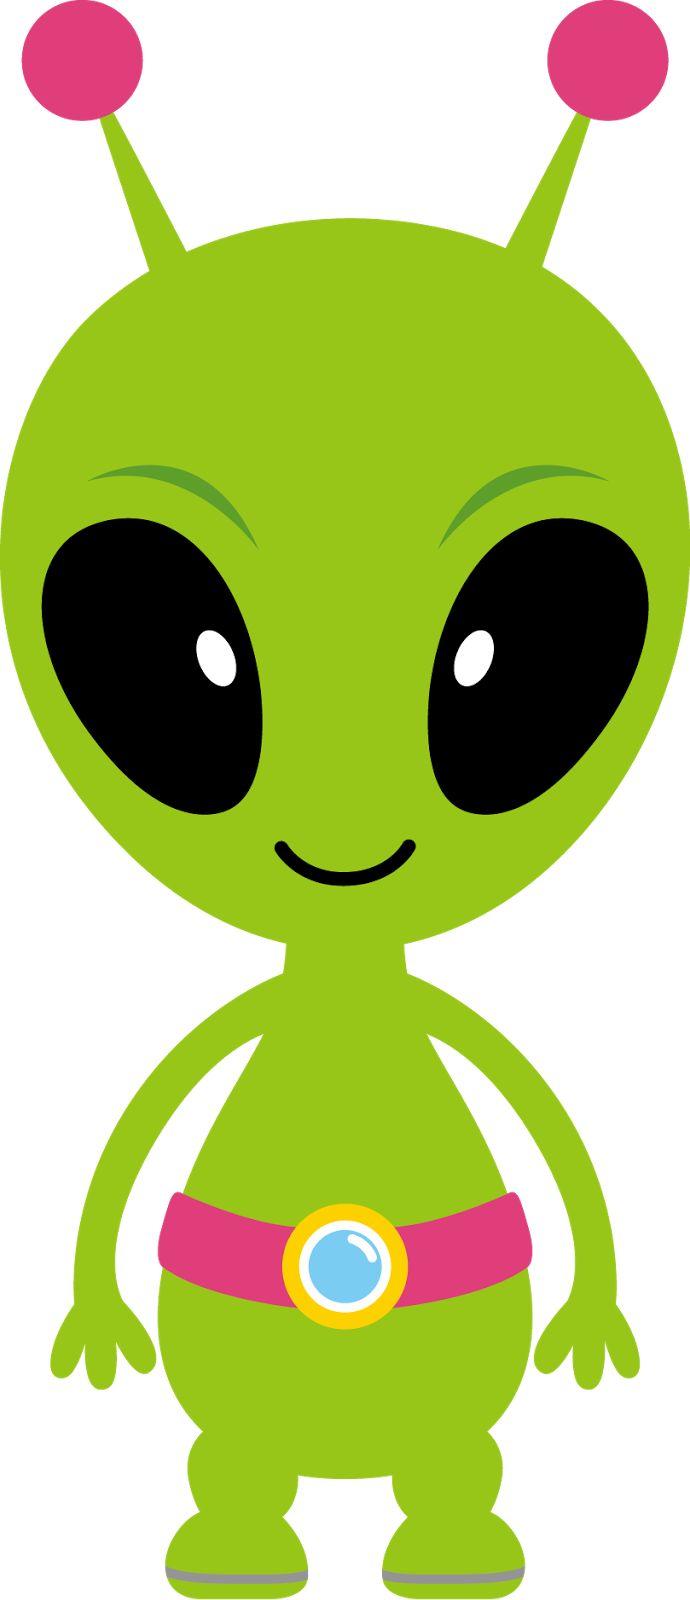 Alien cartoon characters clipart